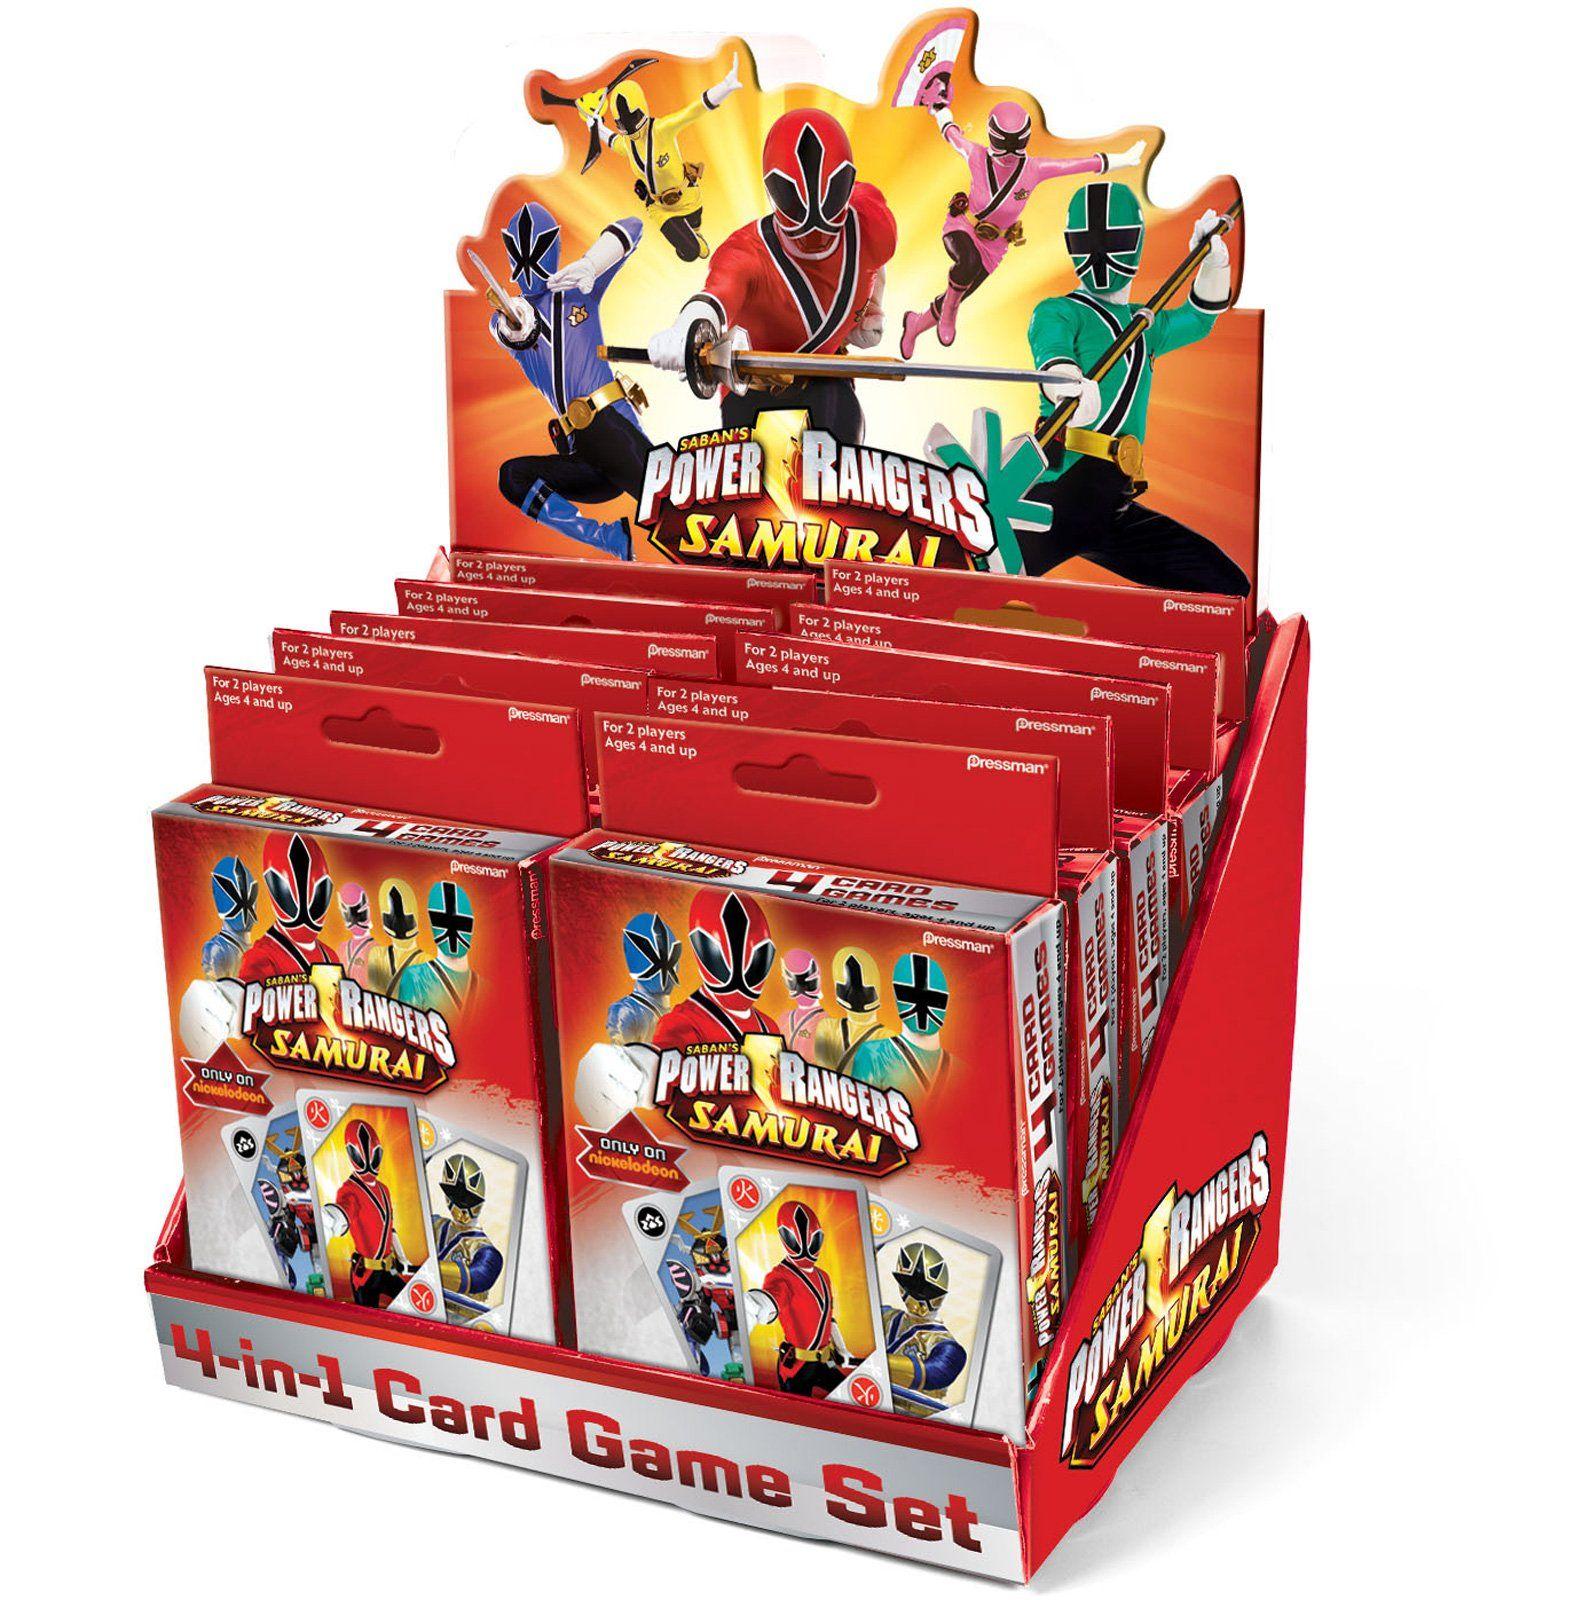 Power Rangers Samurai 4 in 1 Card Game, 85593 Seany